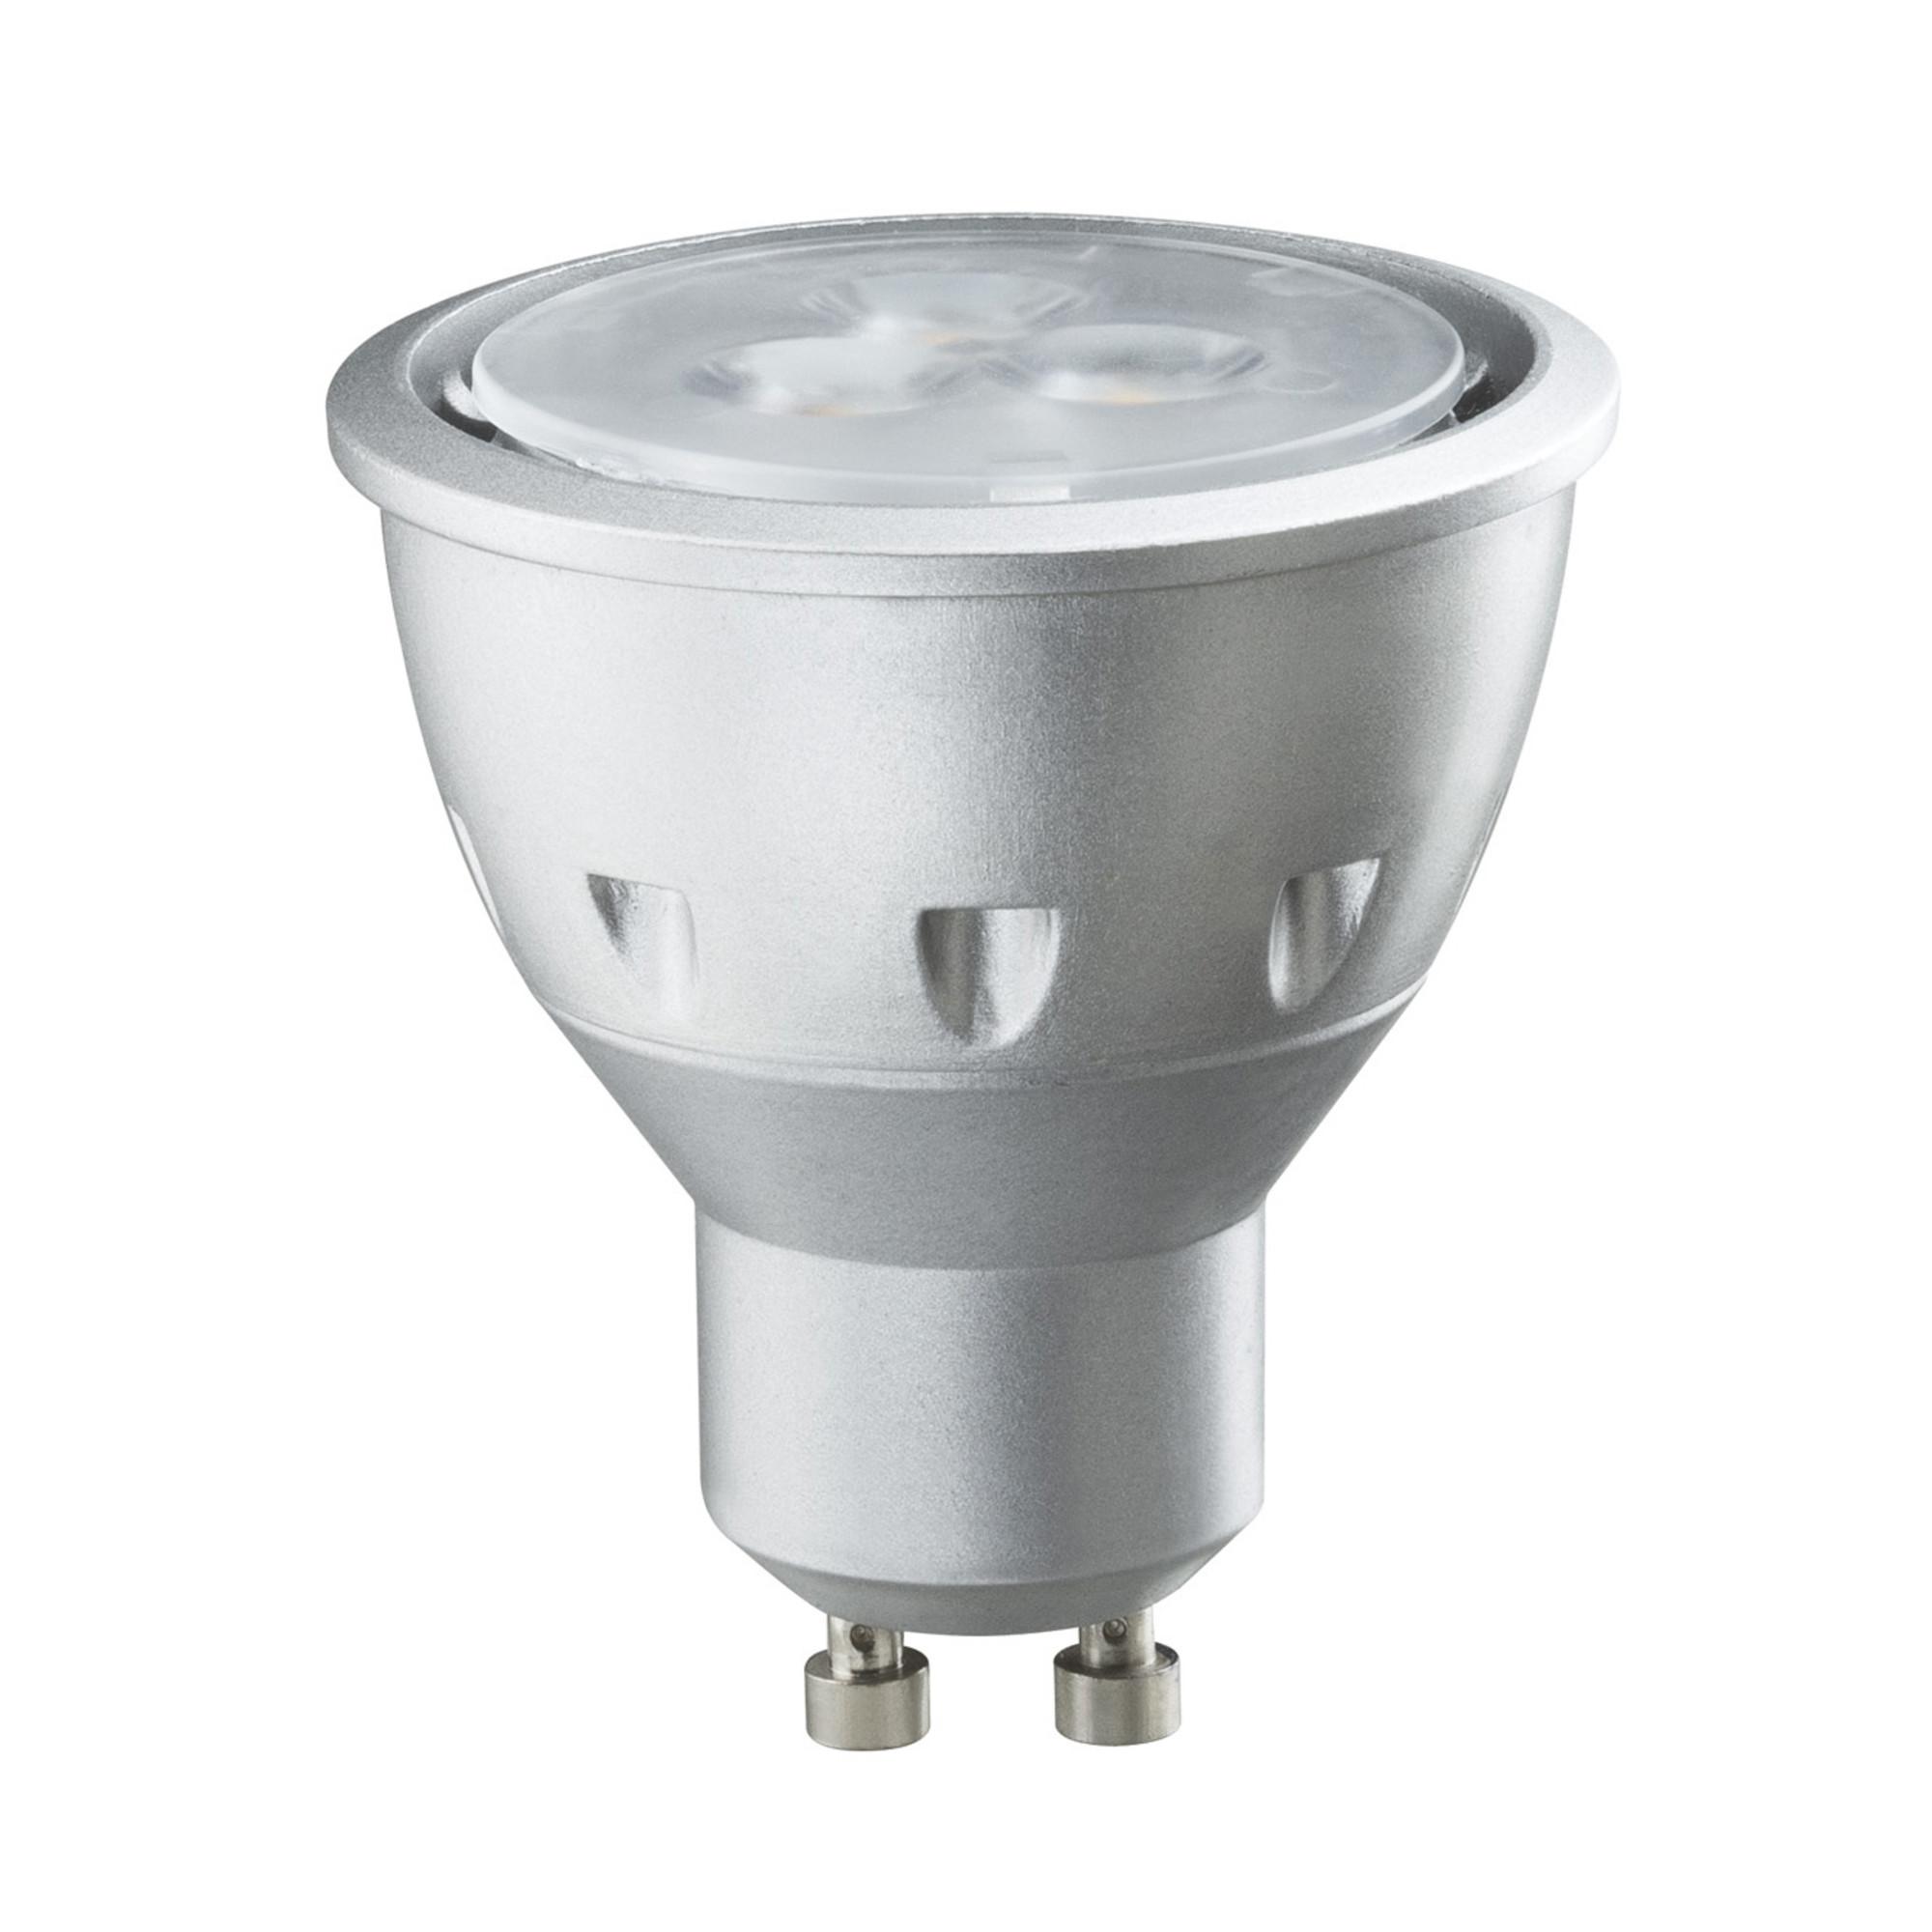 Лампа светодиодная Paulmann 28155 GU10 230 Лм теплый свет